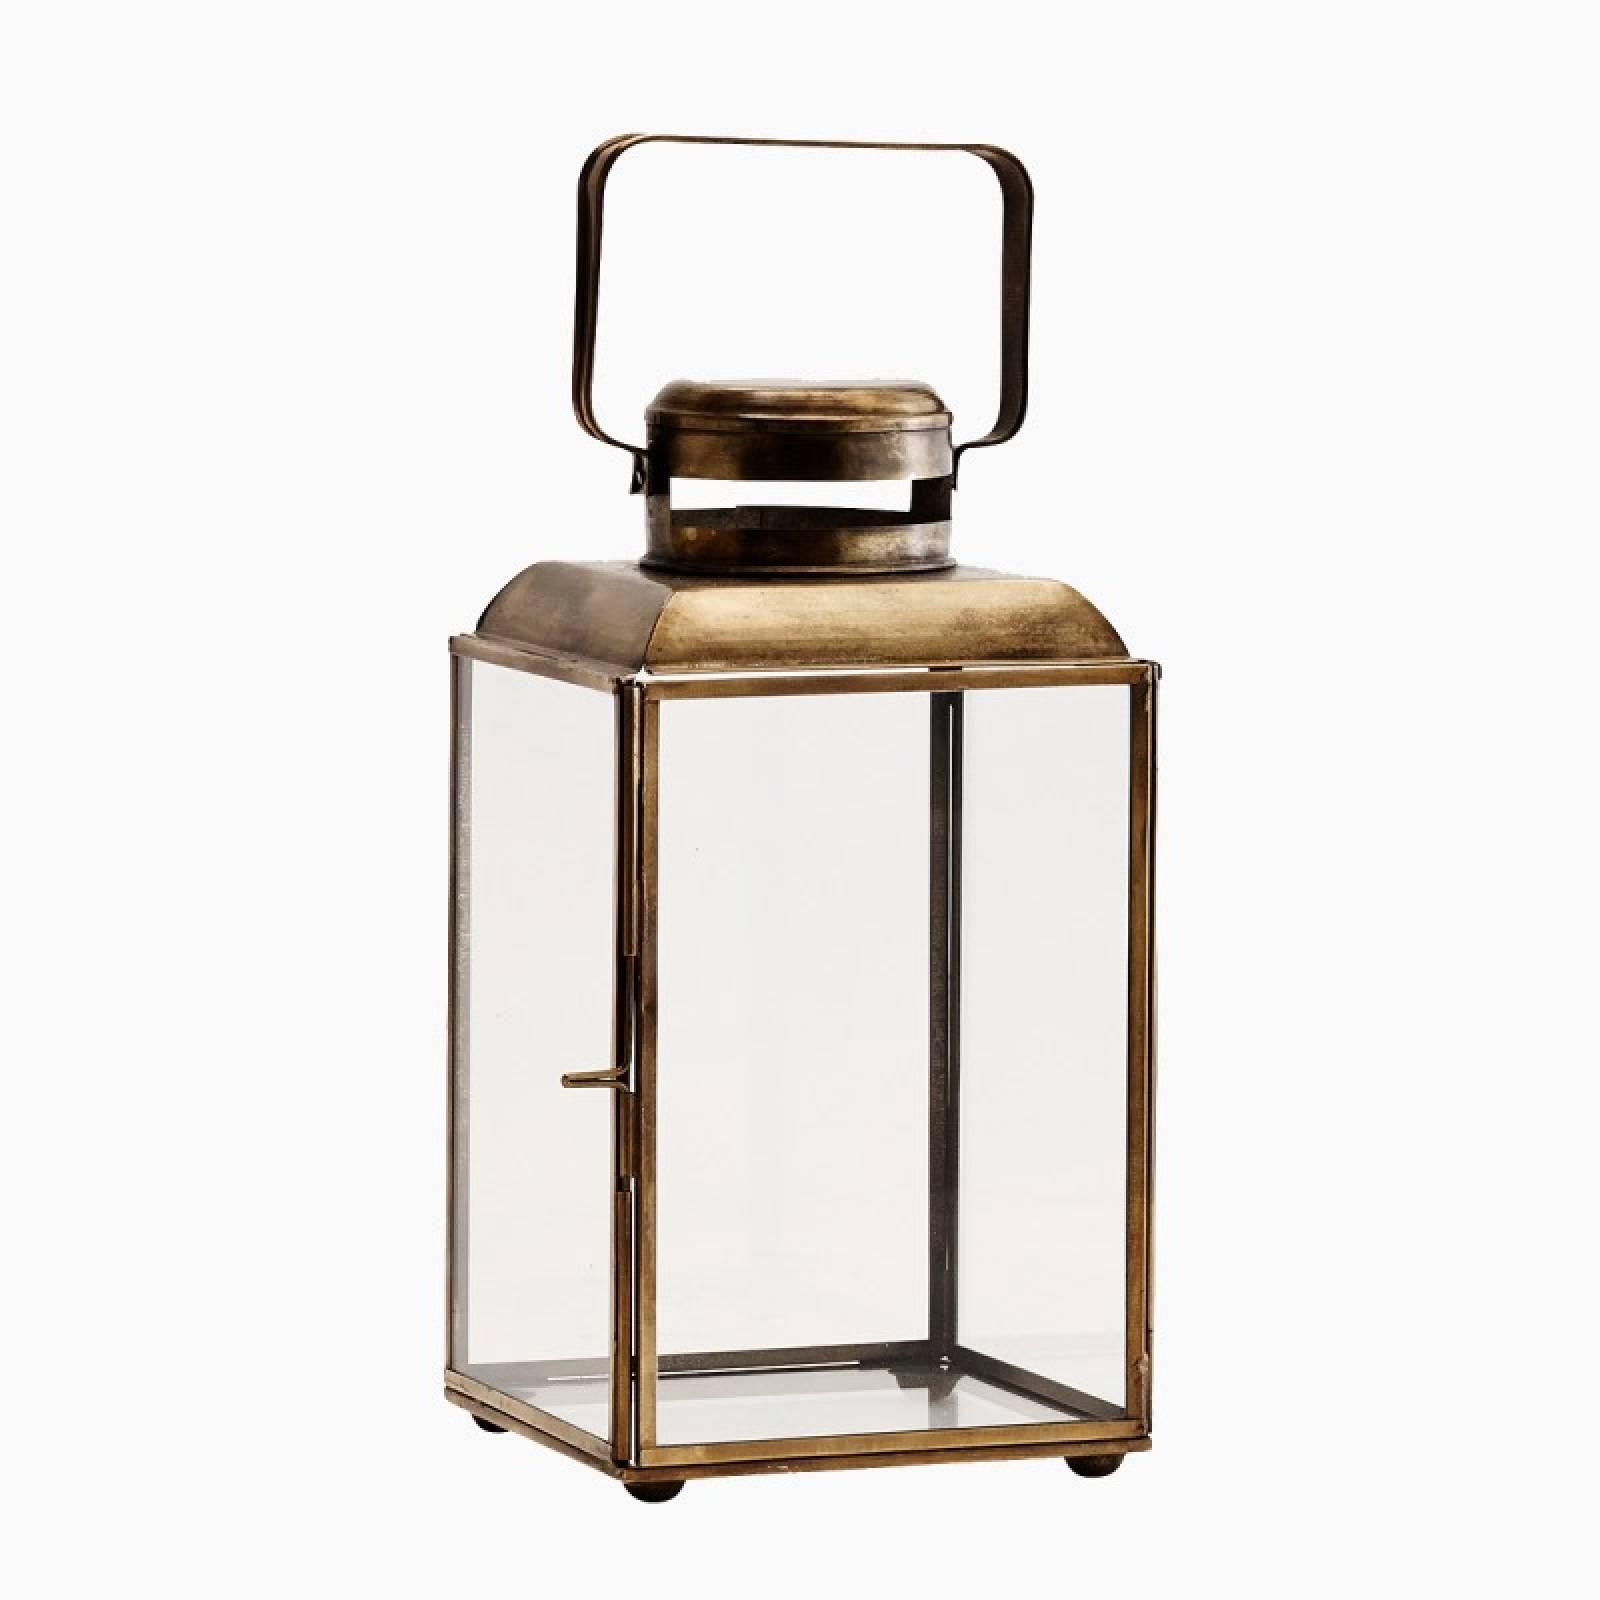 Glass Lantern In Antique Brass With Rectangular Handle H26cm